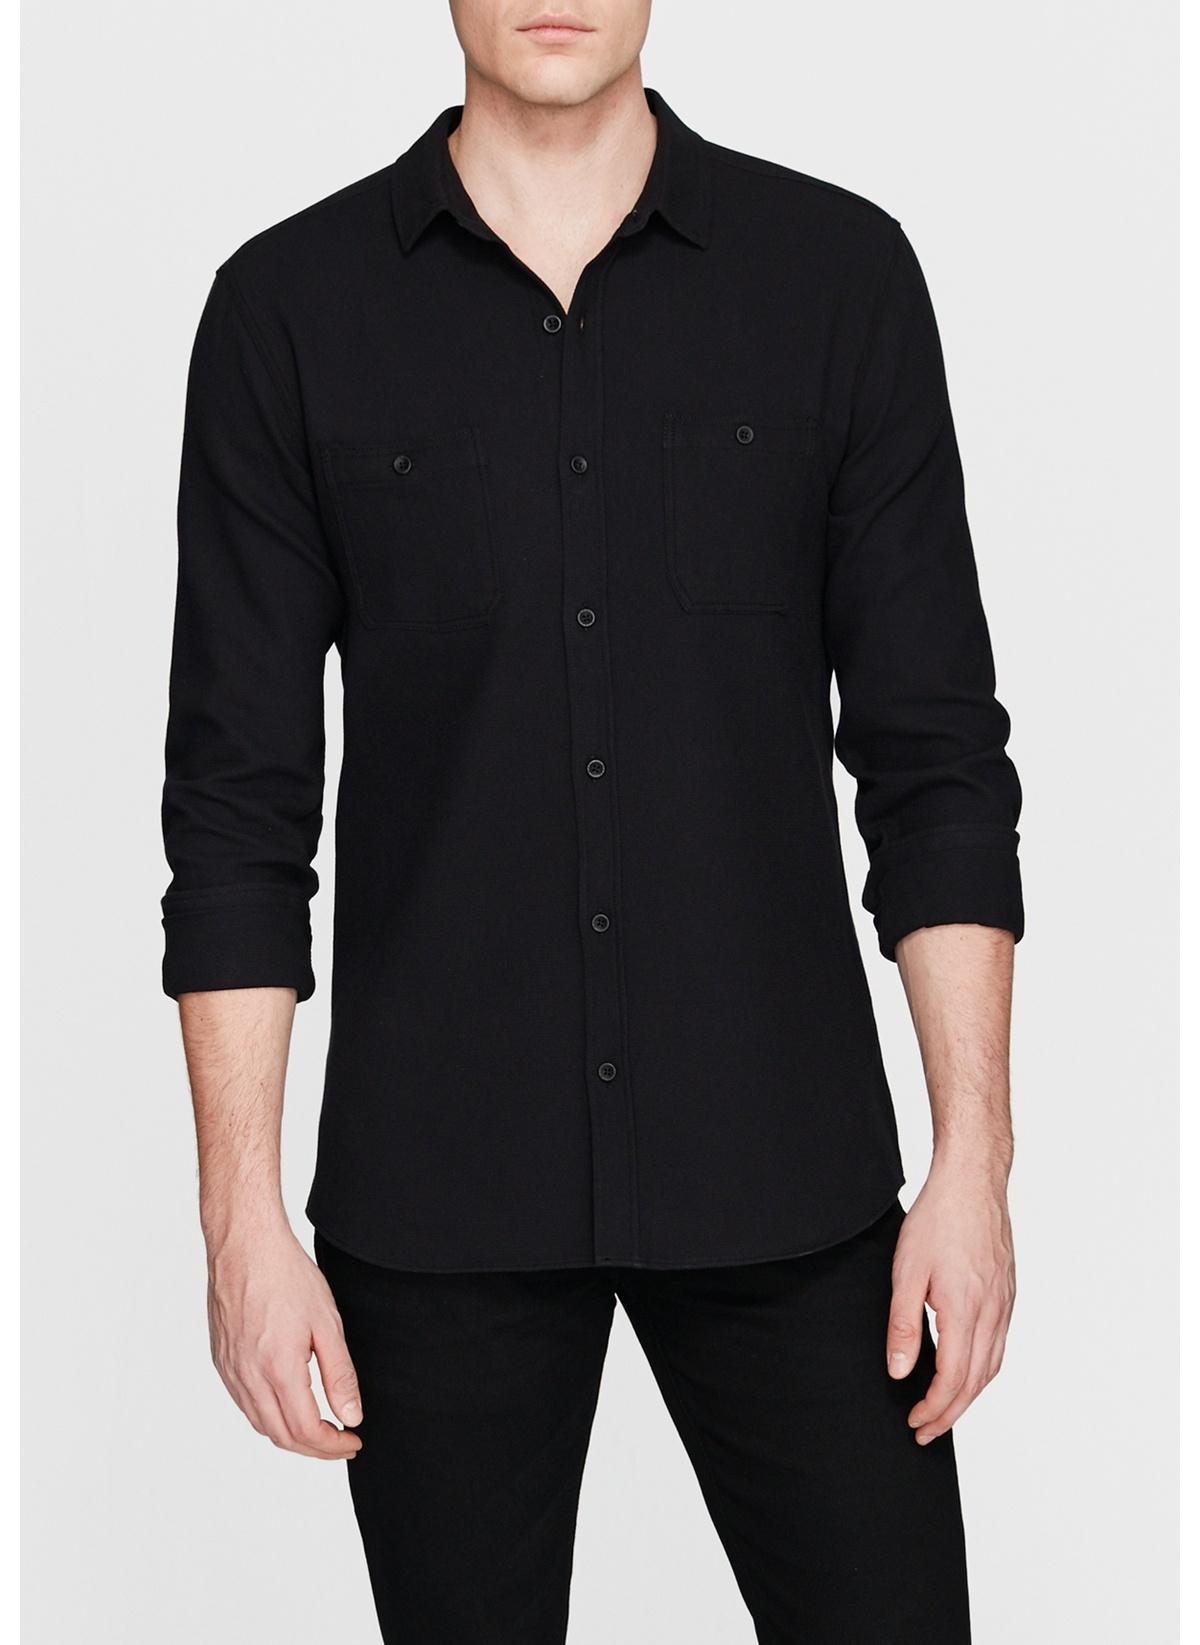 Mavi Çift Cepli Gömlek 8802020-900 Çift Cepli Siyah Gömlek – 89.99 TL